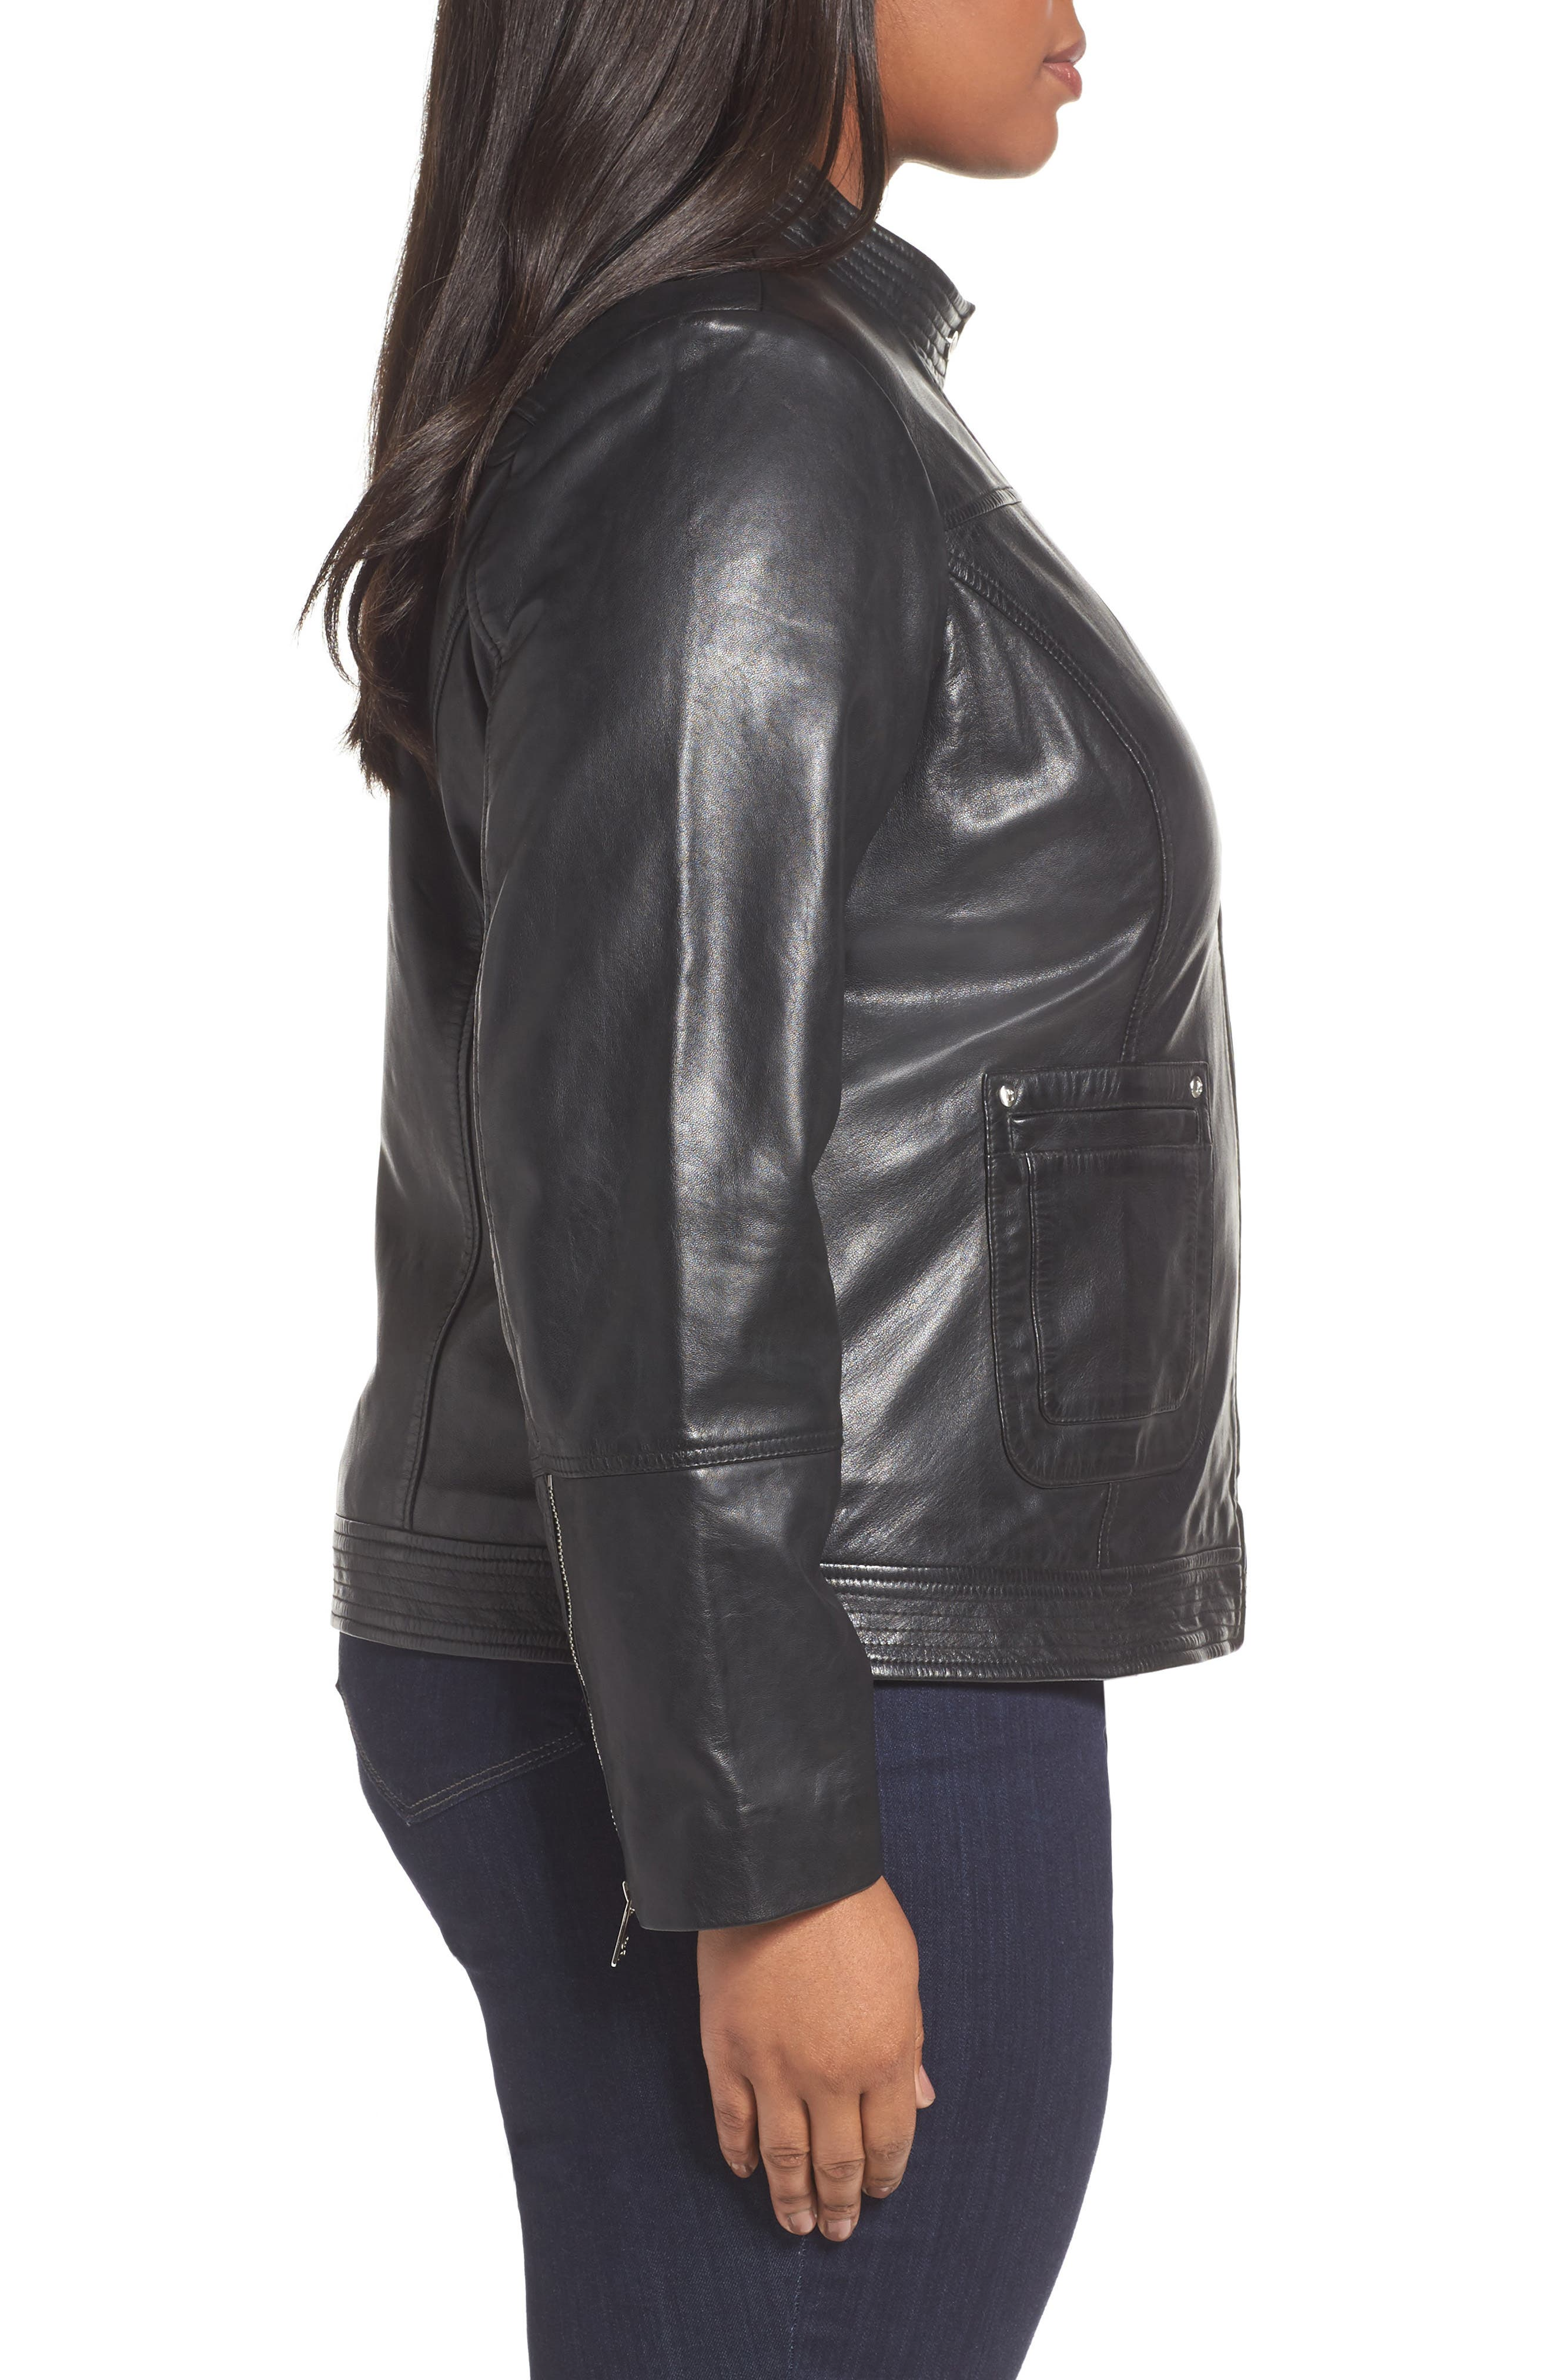 Kirwin Sheepskin Leather Jacket,                             Alternate thumbnail 3, color,                             001